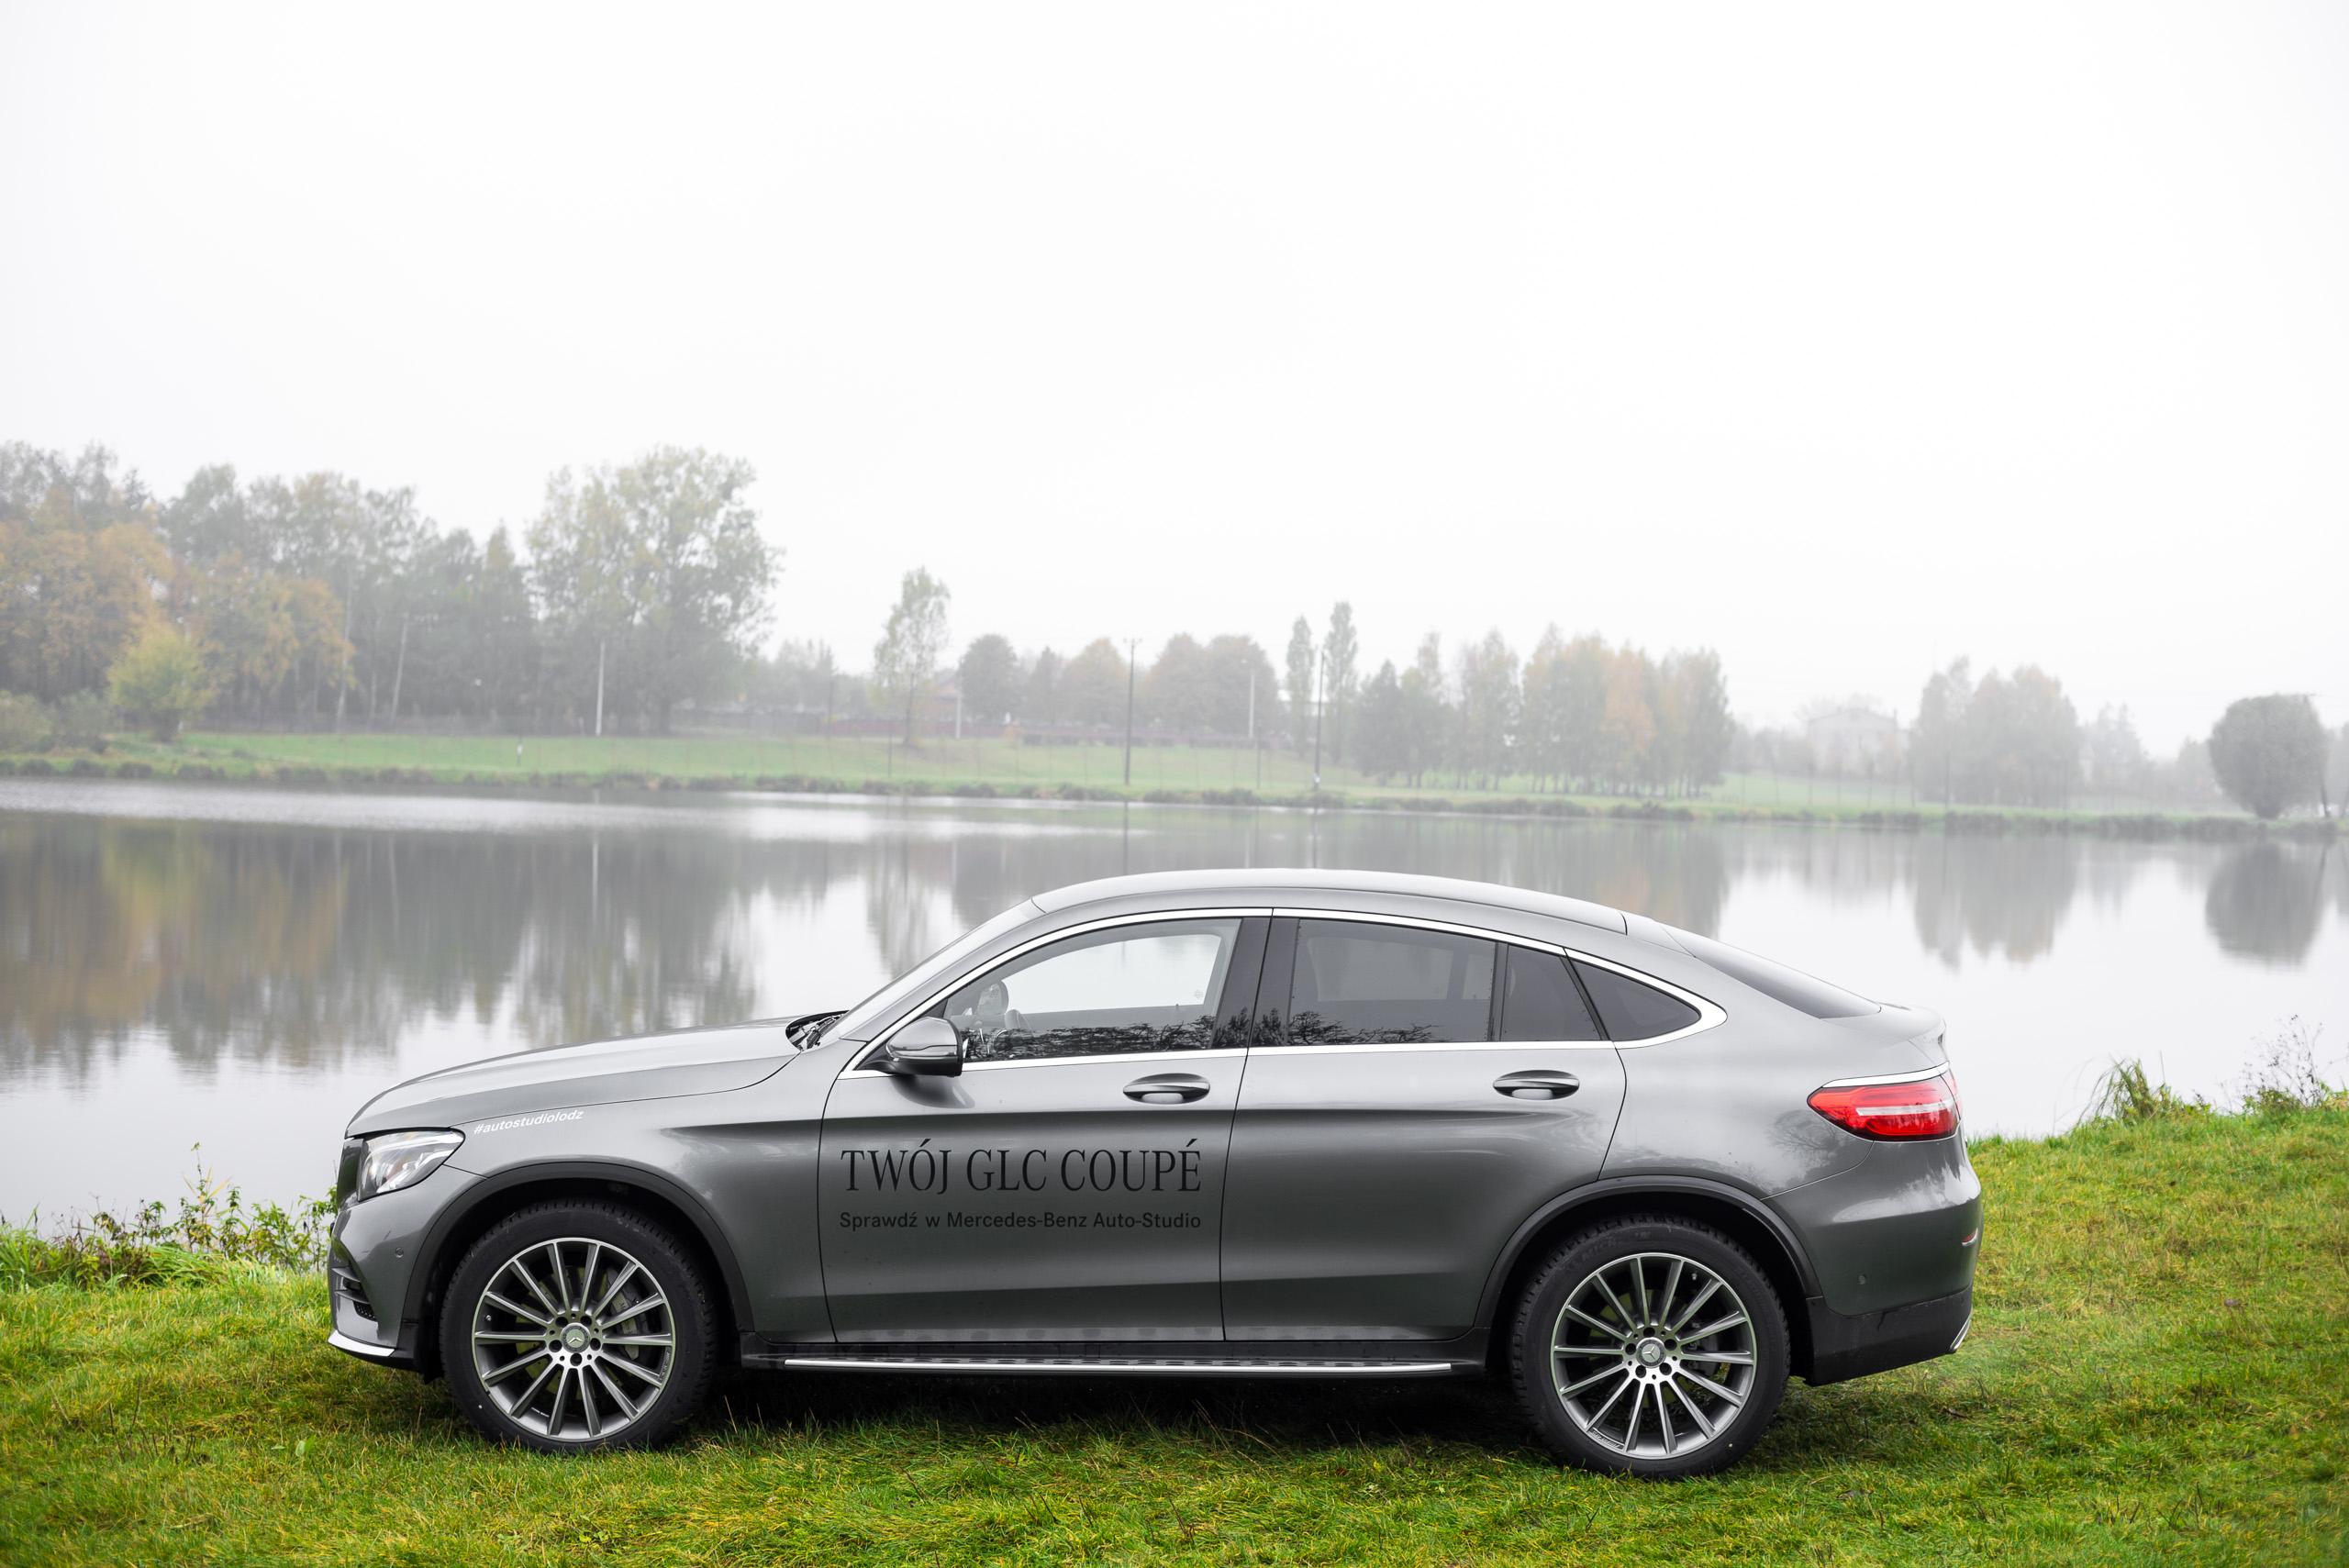 Mercedes Benz GLC 250 4MATIC Coupé test